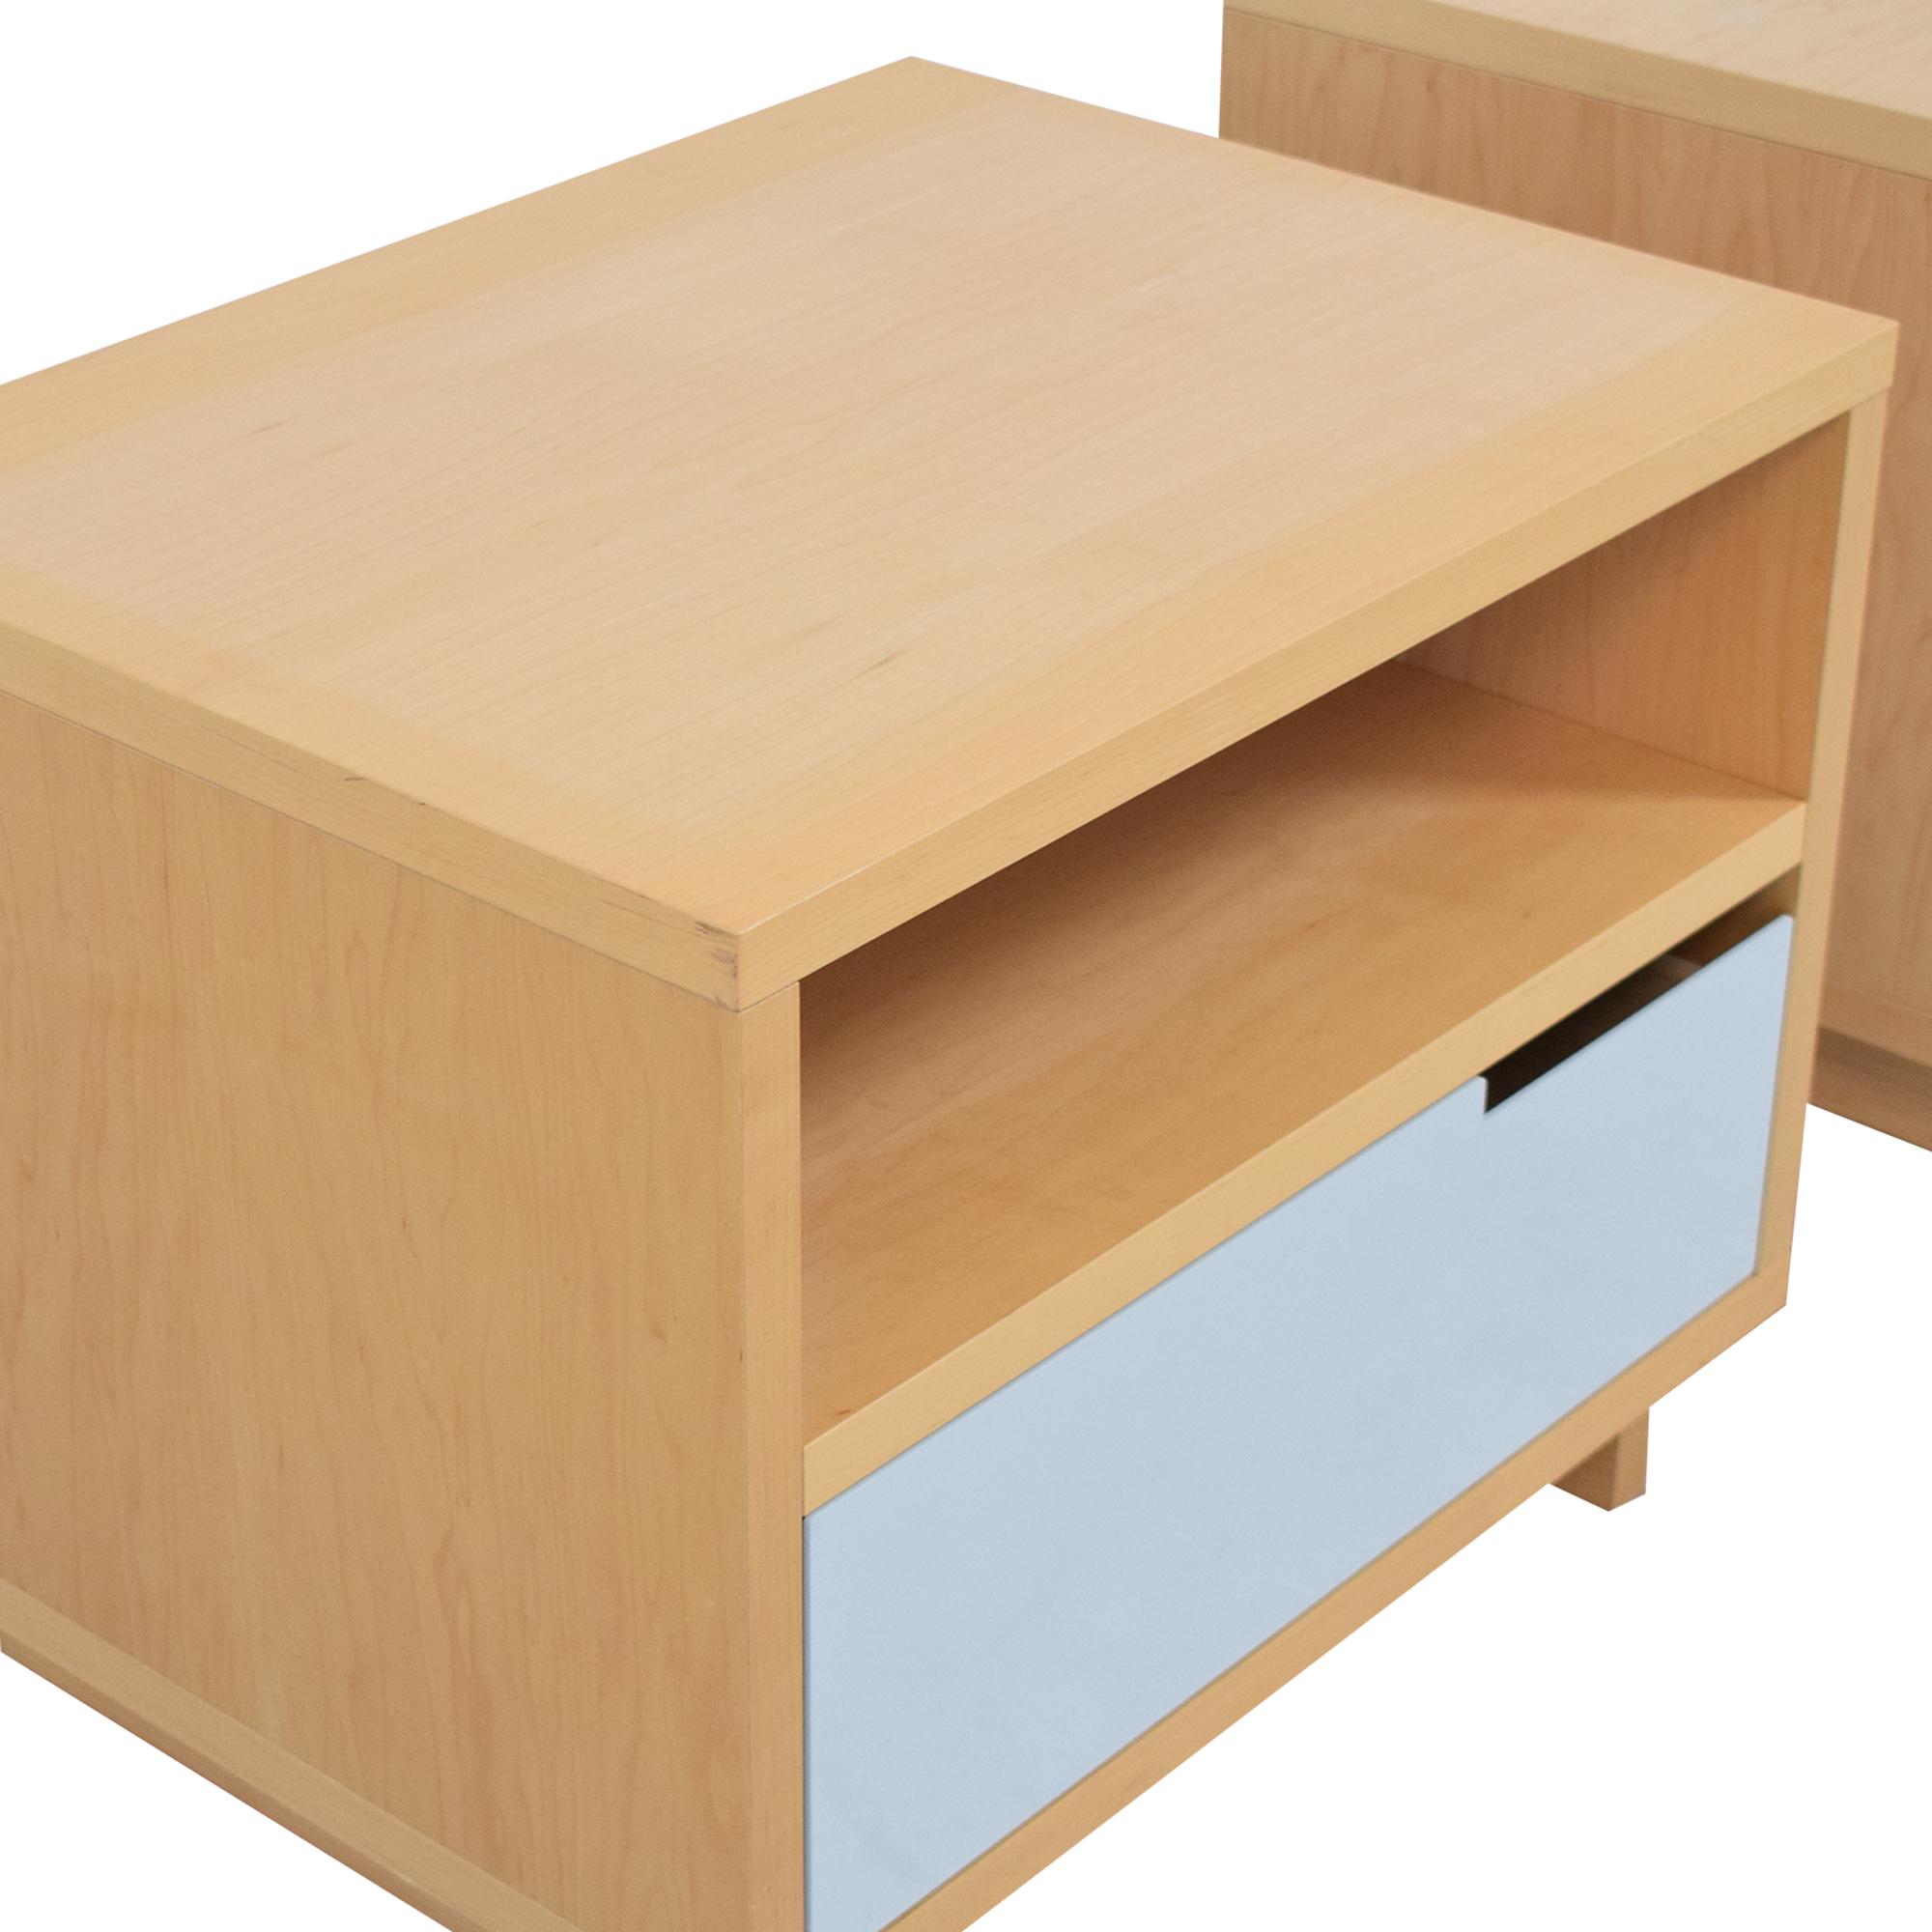 Blu Dot Blu Dot Modu-licious Bedside Tables nyc